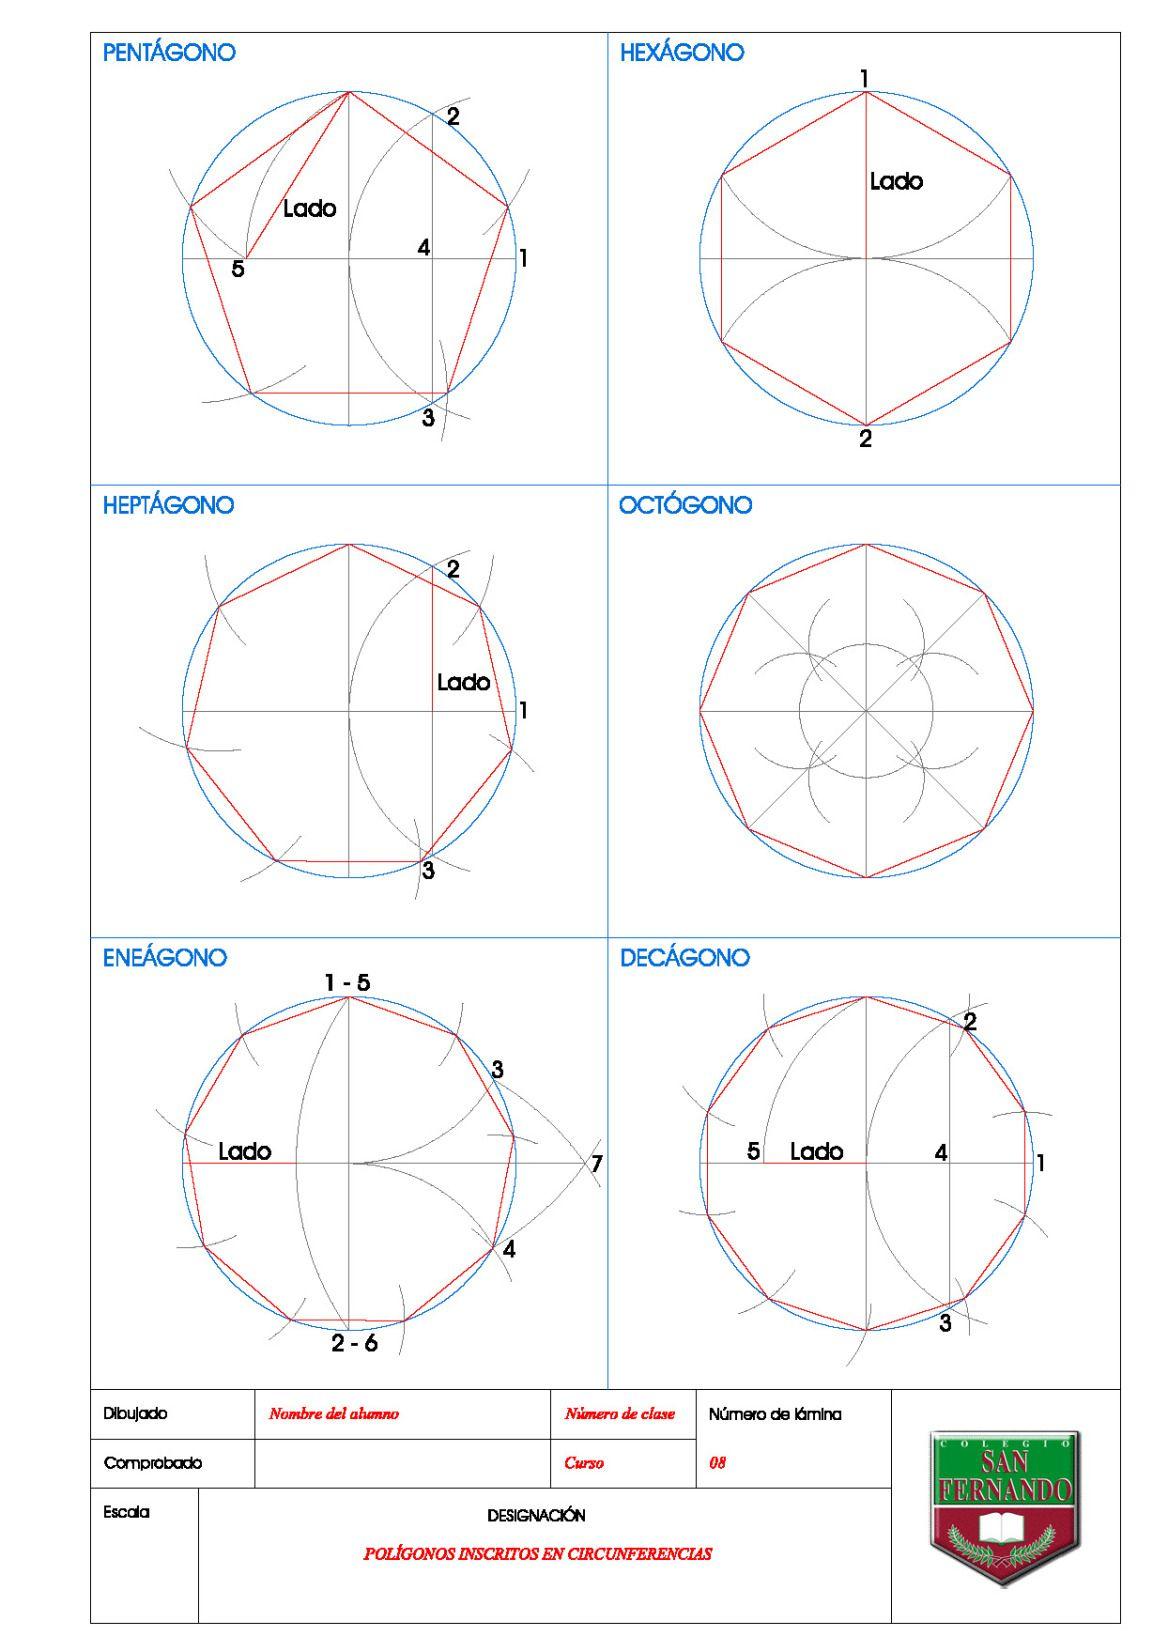 Poligonos Inscritos En Circunferencias Dibujos De Geometria Arte De Geometria Clases De Dibujo Tecnico